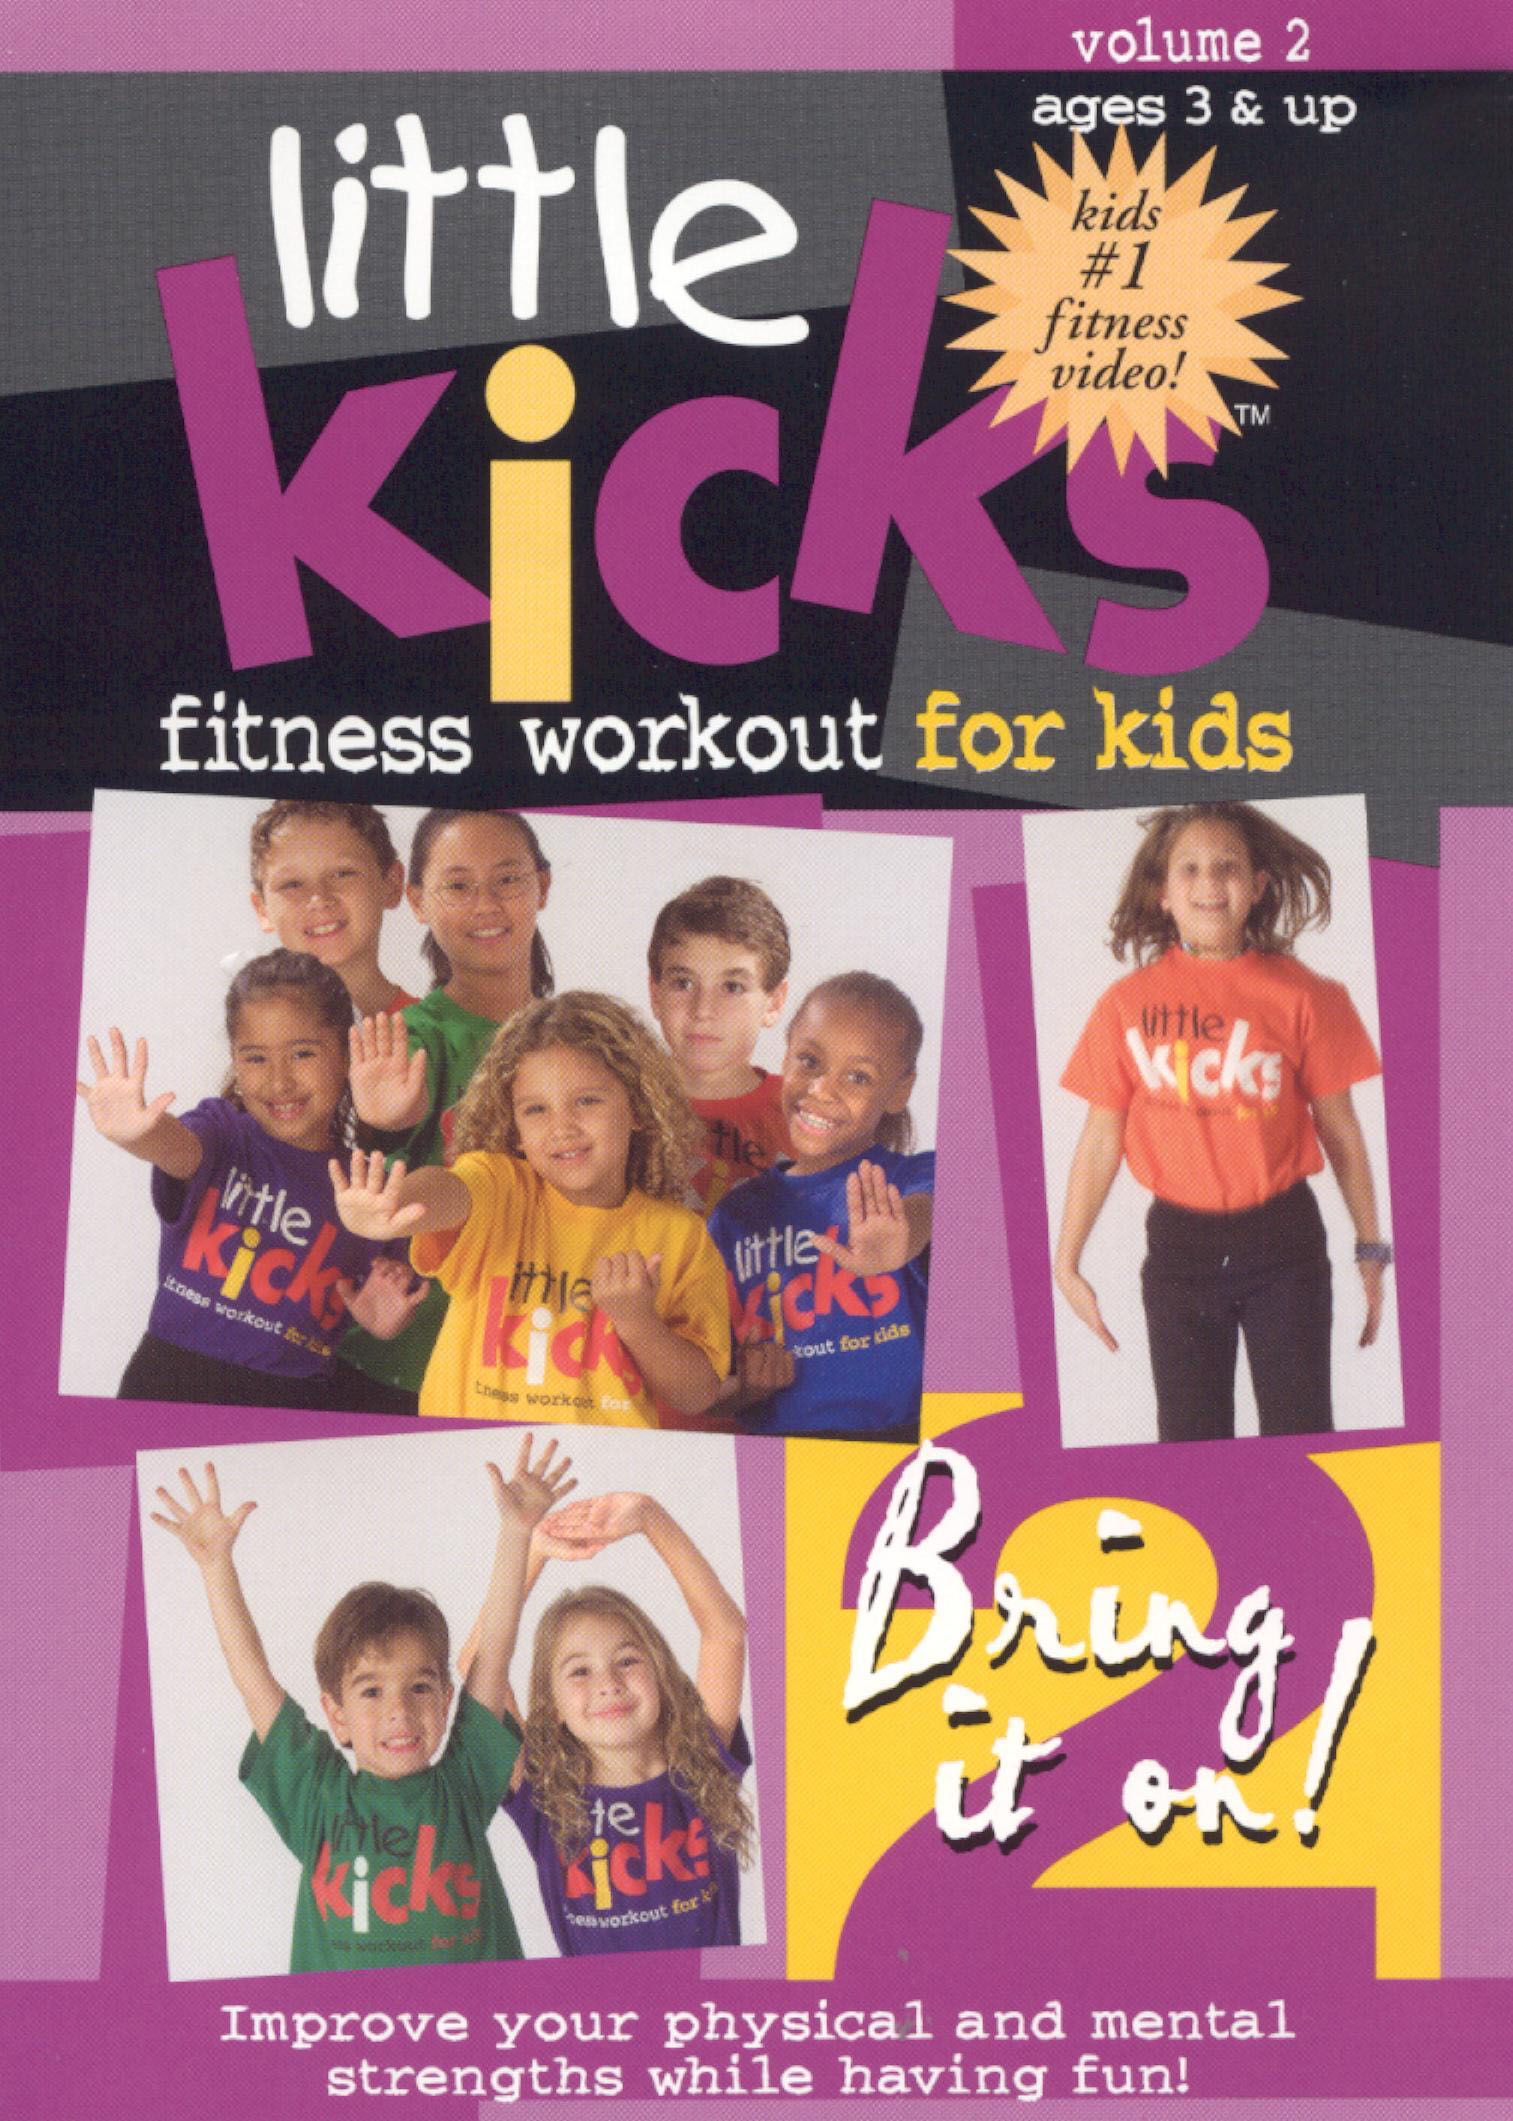 Little Kicks: Fitness Workout for Kids, Vol. 2 - Bring It On!